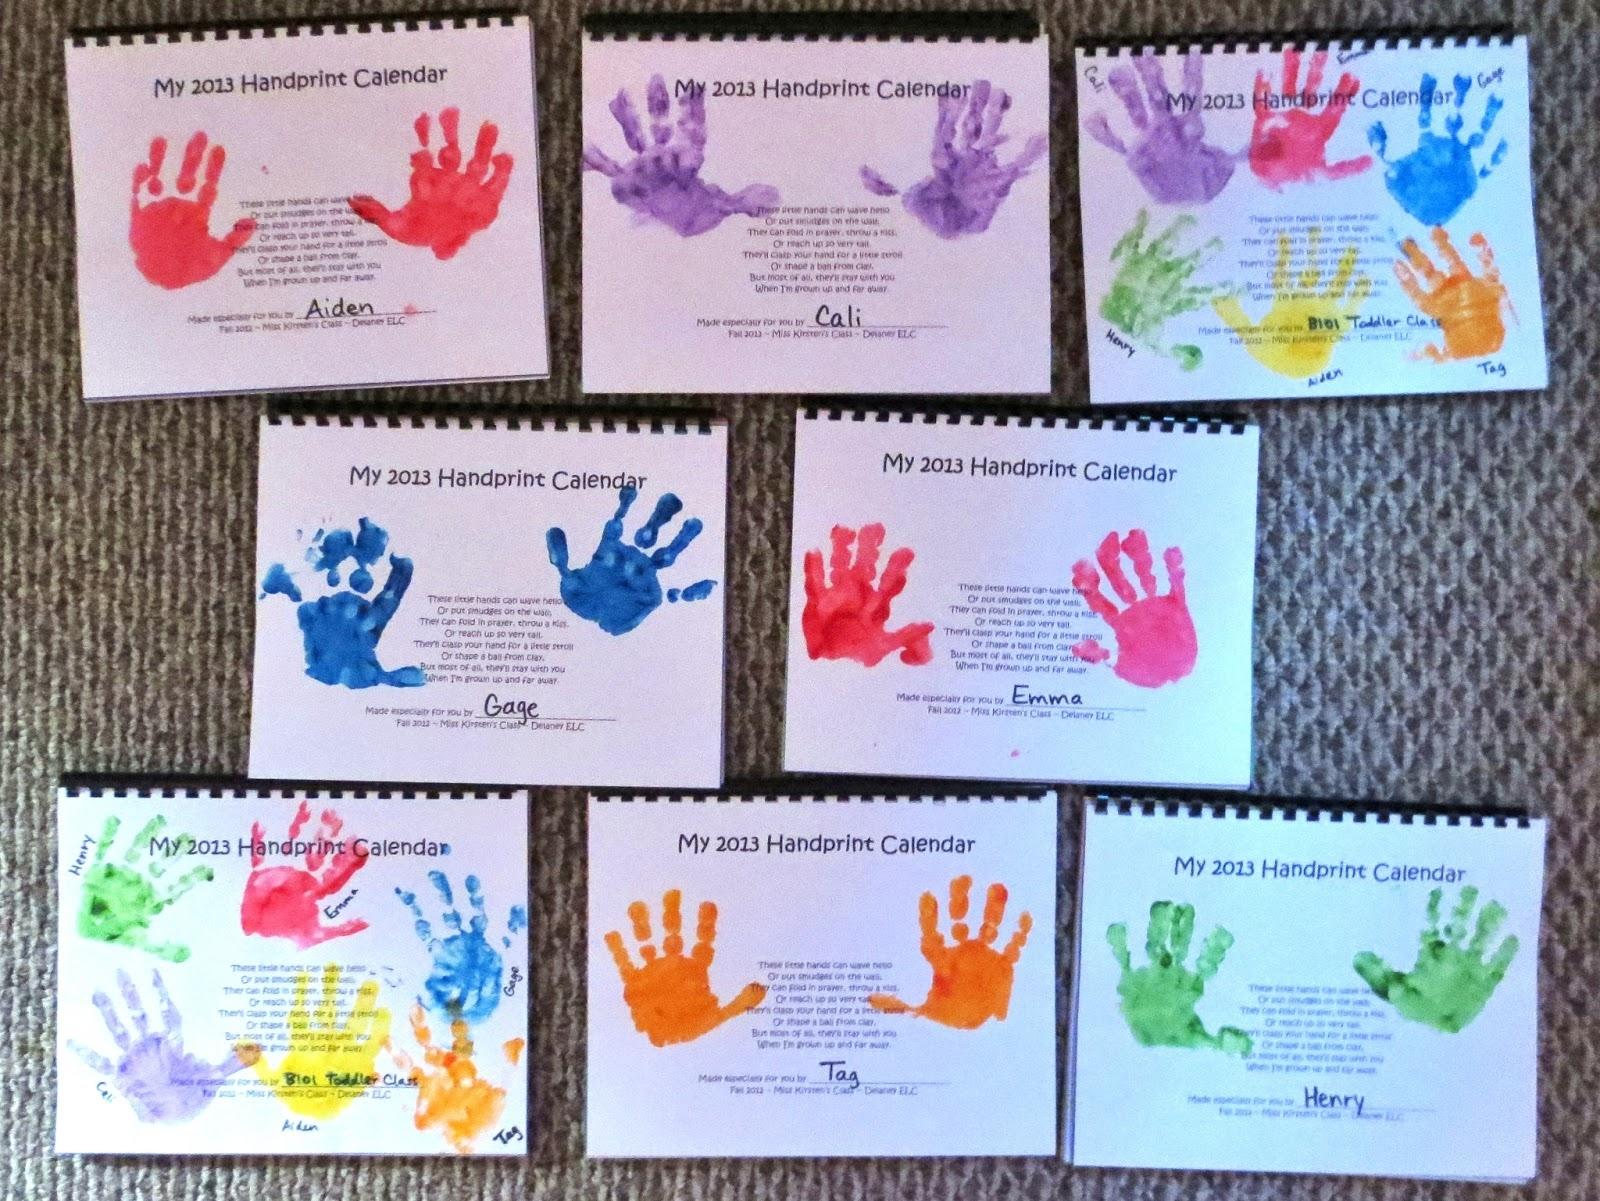 Princesses, Pies, & Preschool Pizzazz: Bible Verse Handprint Calendar with regard to Advent Calendar Gifts With Verses